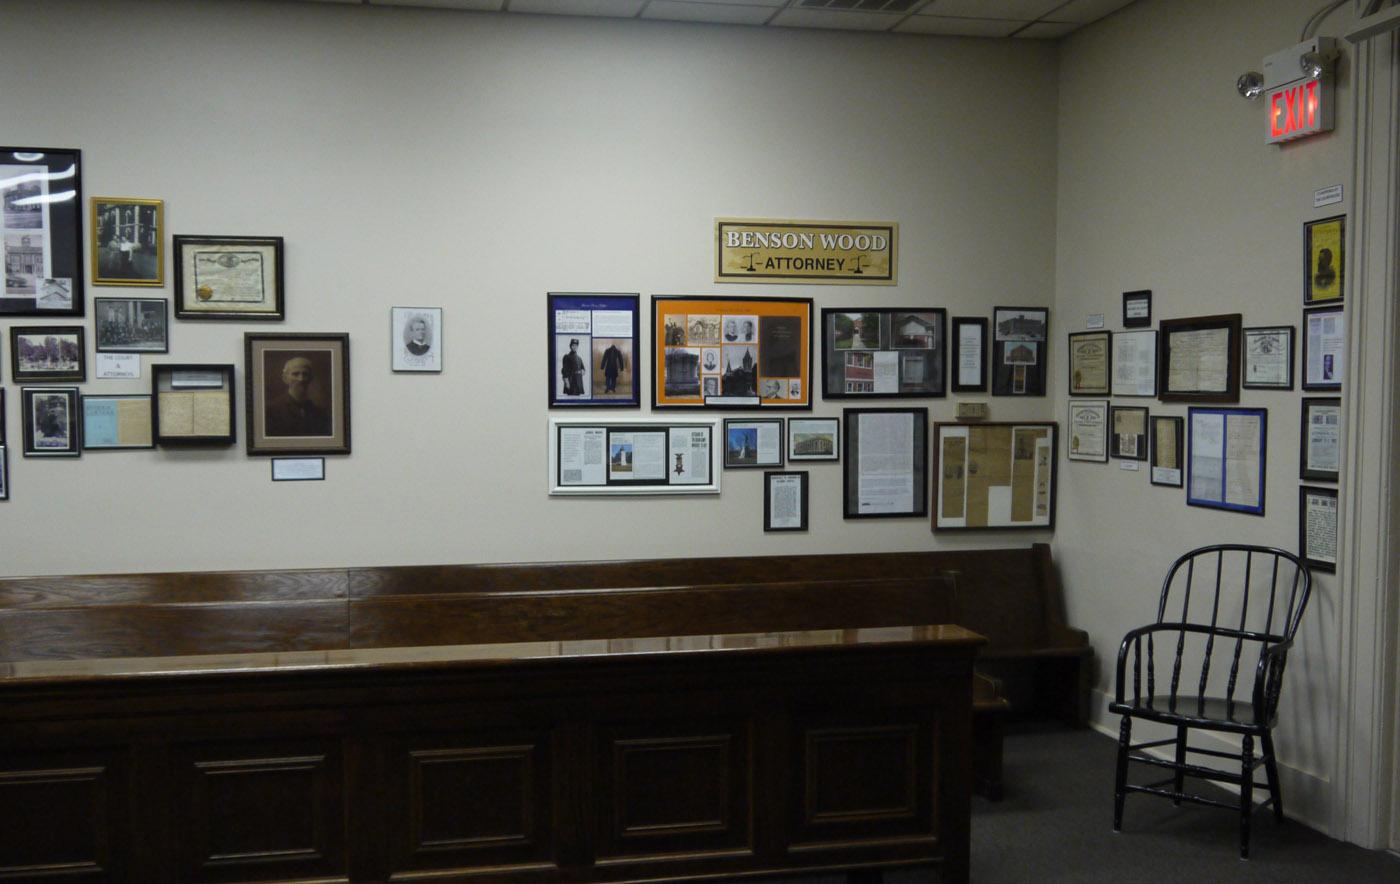 Benson Wood history